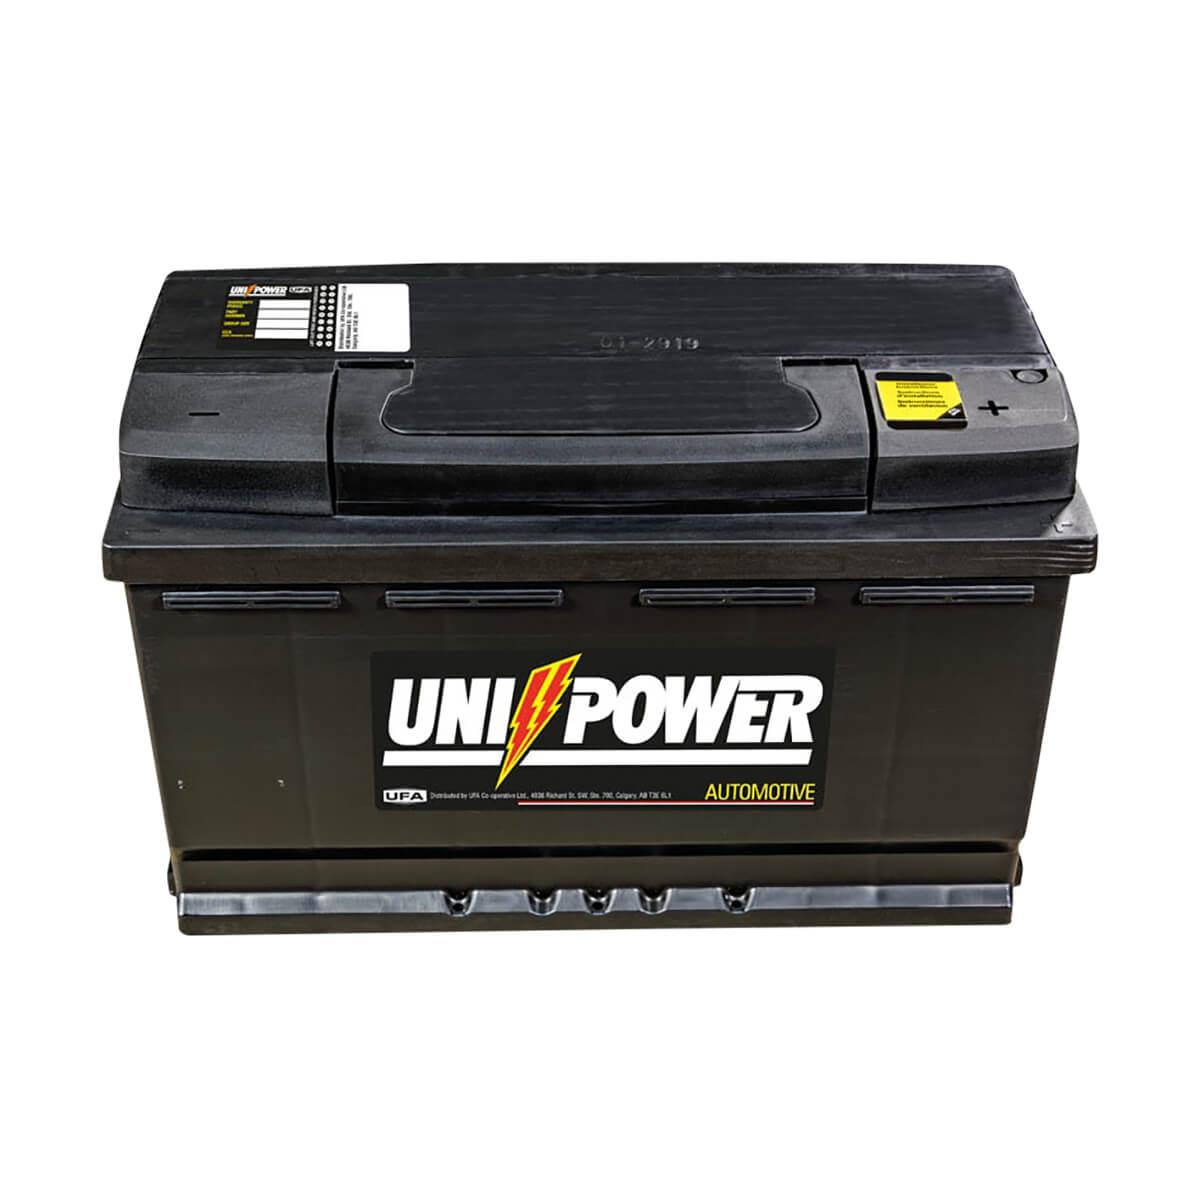 Uni-Power Auto/Truck/SUV Battery - 65-H7C